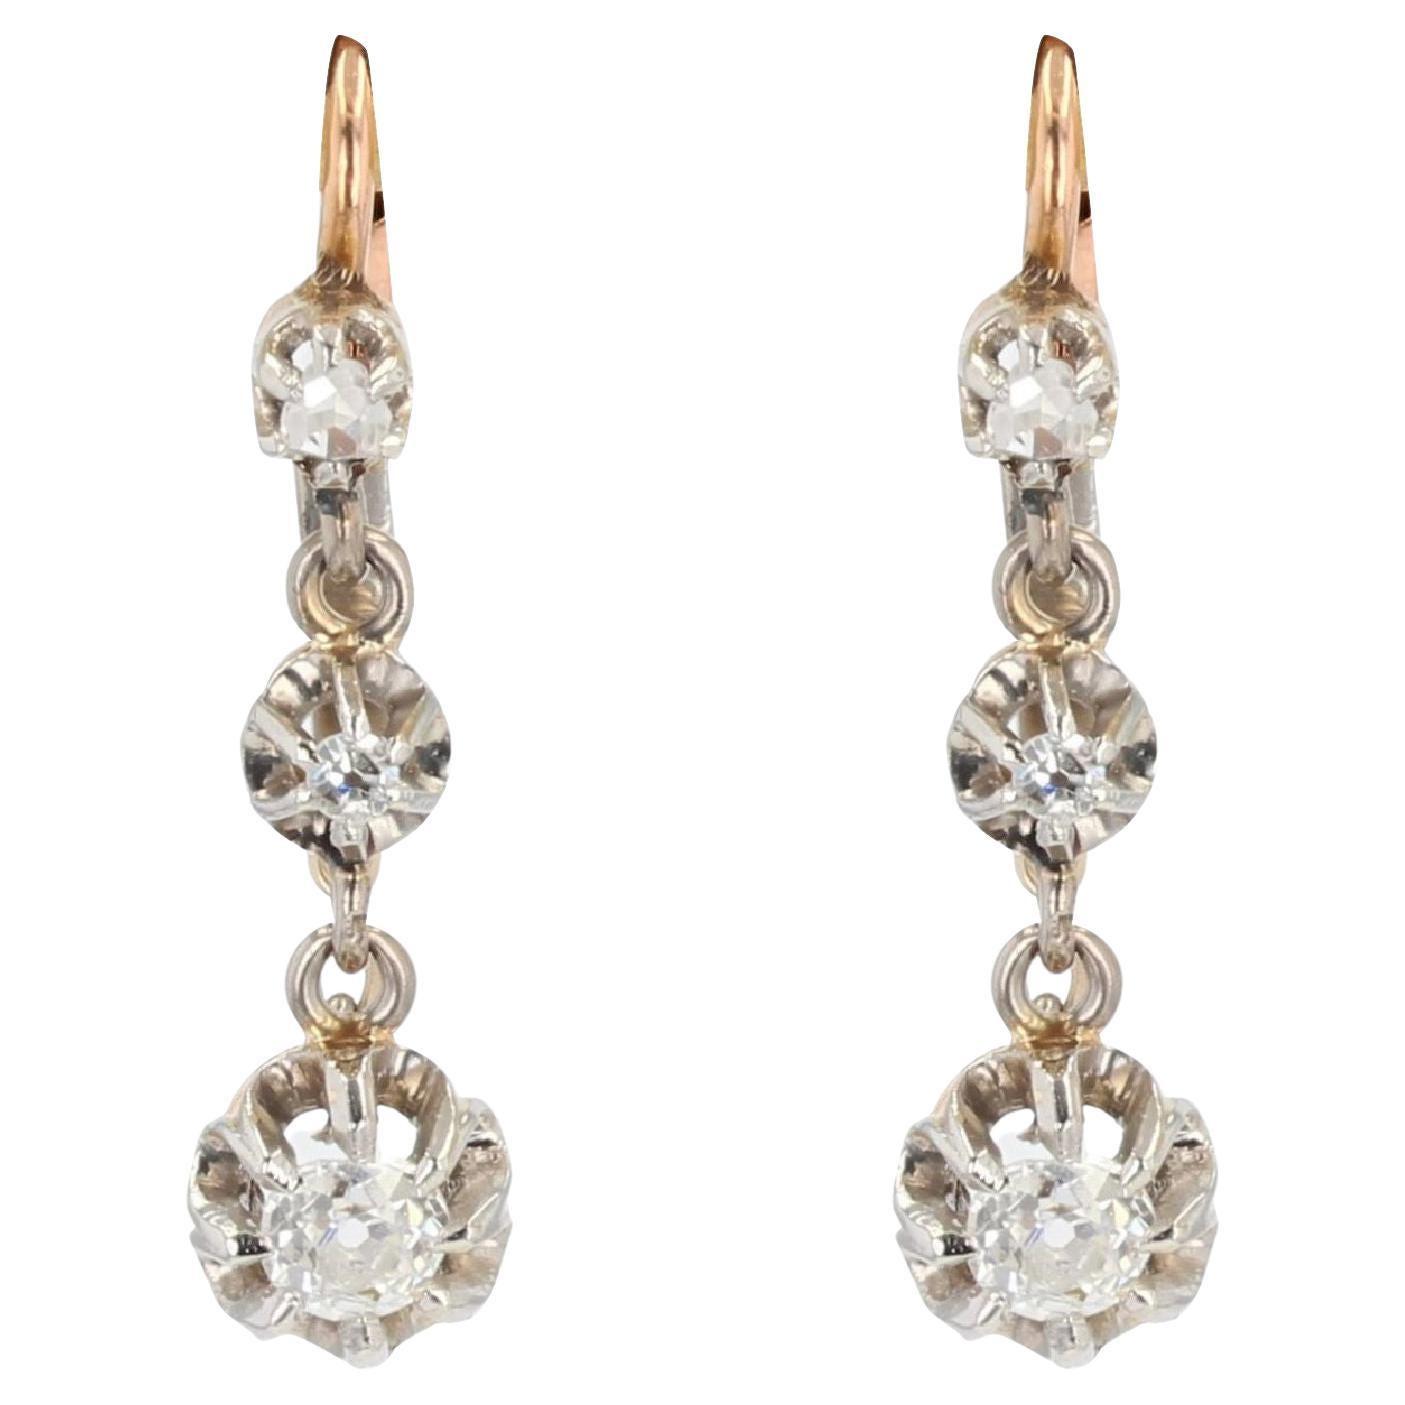 French 19th Century Diamonds 18 Karat Rose Gold Dangle Earrings